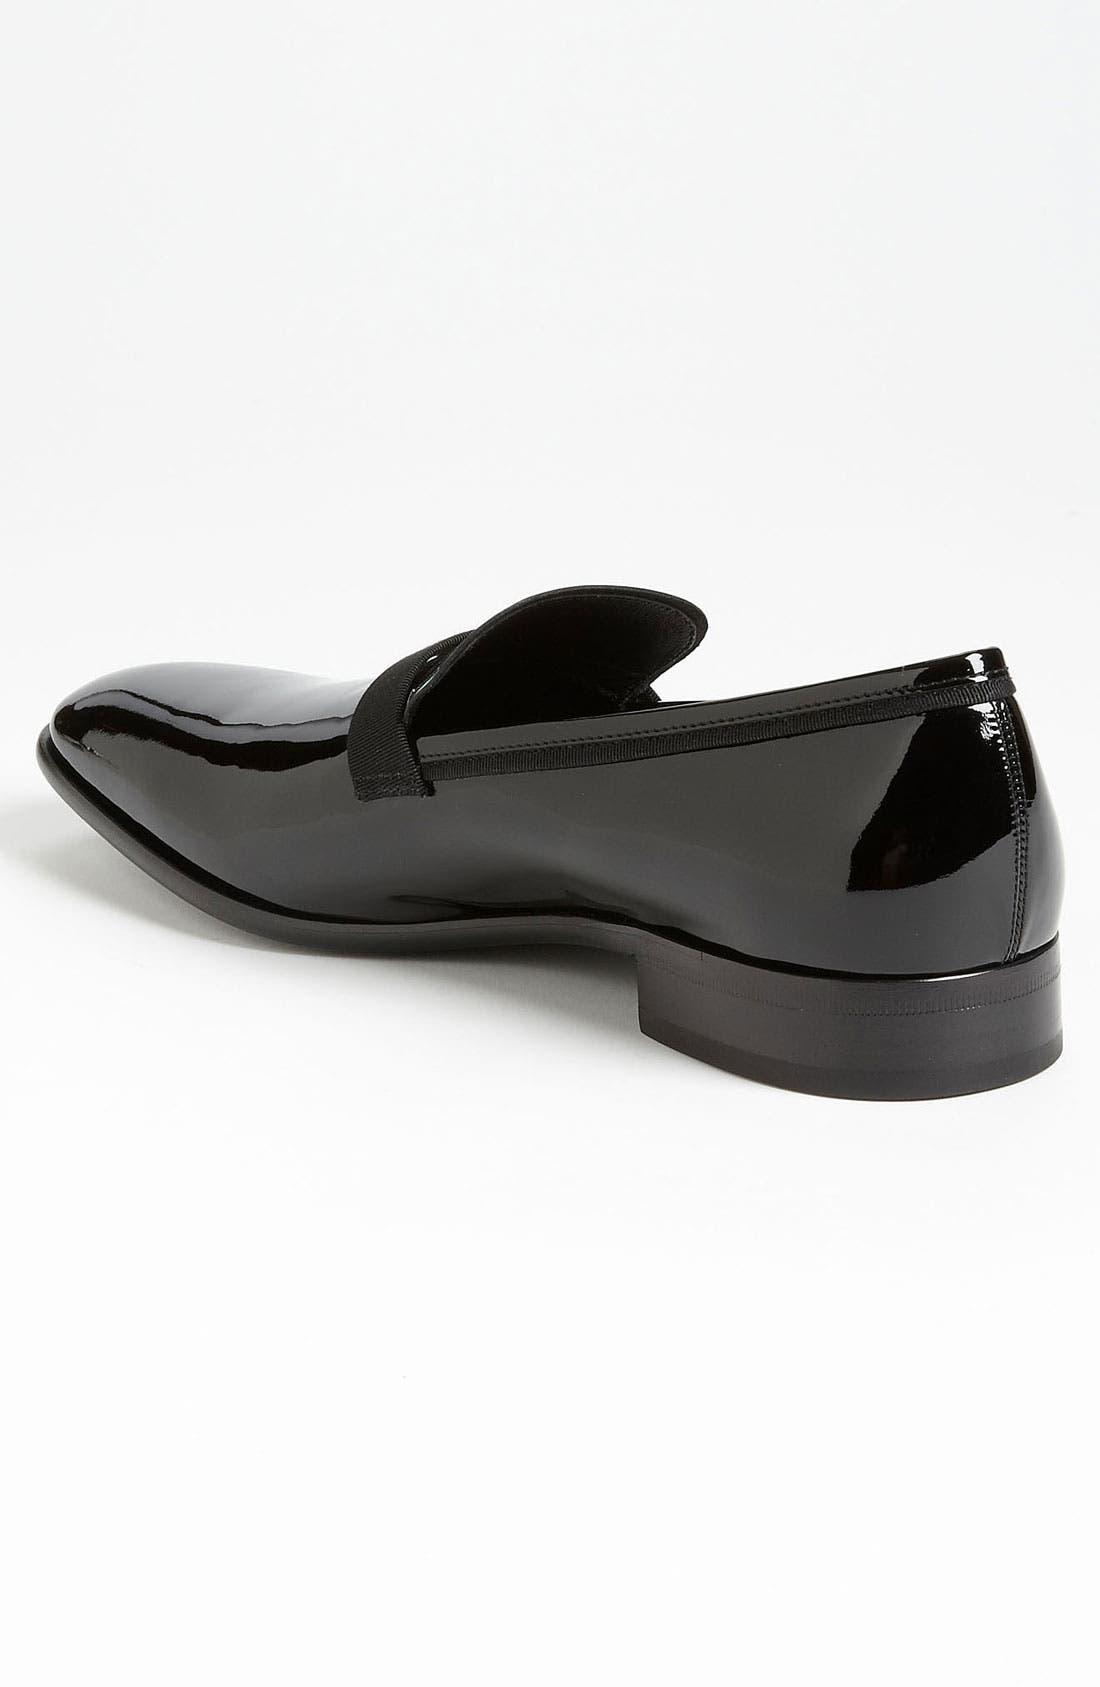 Alternate Image 2  - Salvatore Ferragamo 'Antoane' Formal Loafer